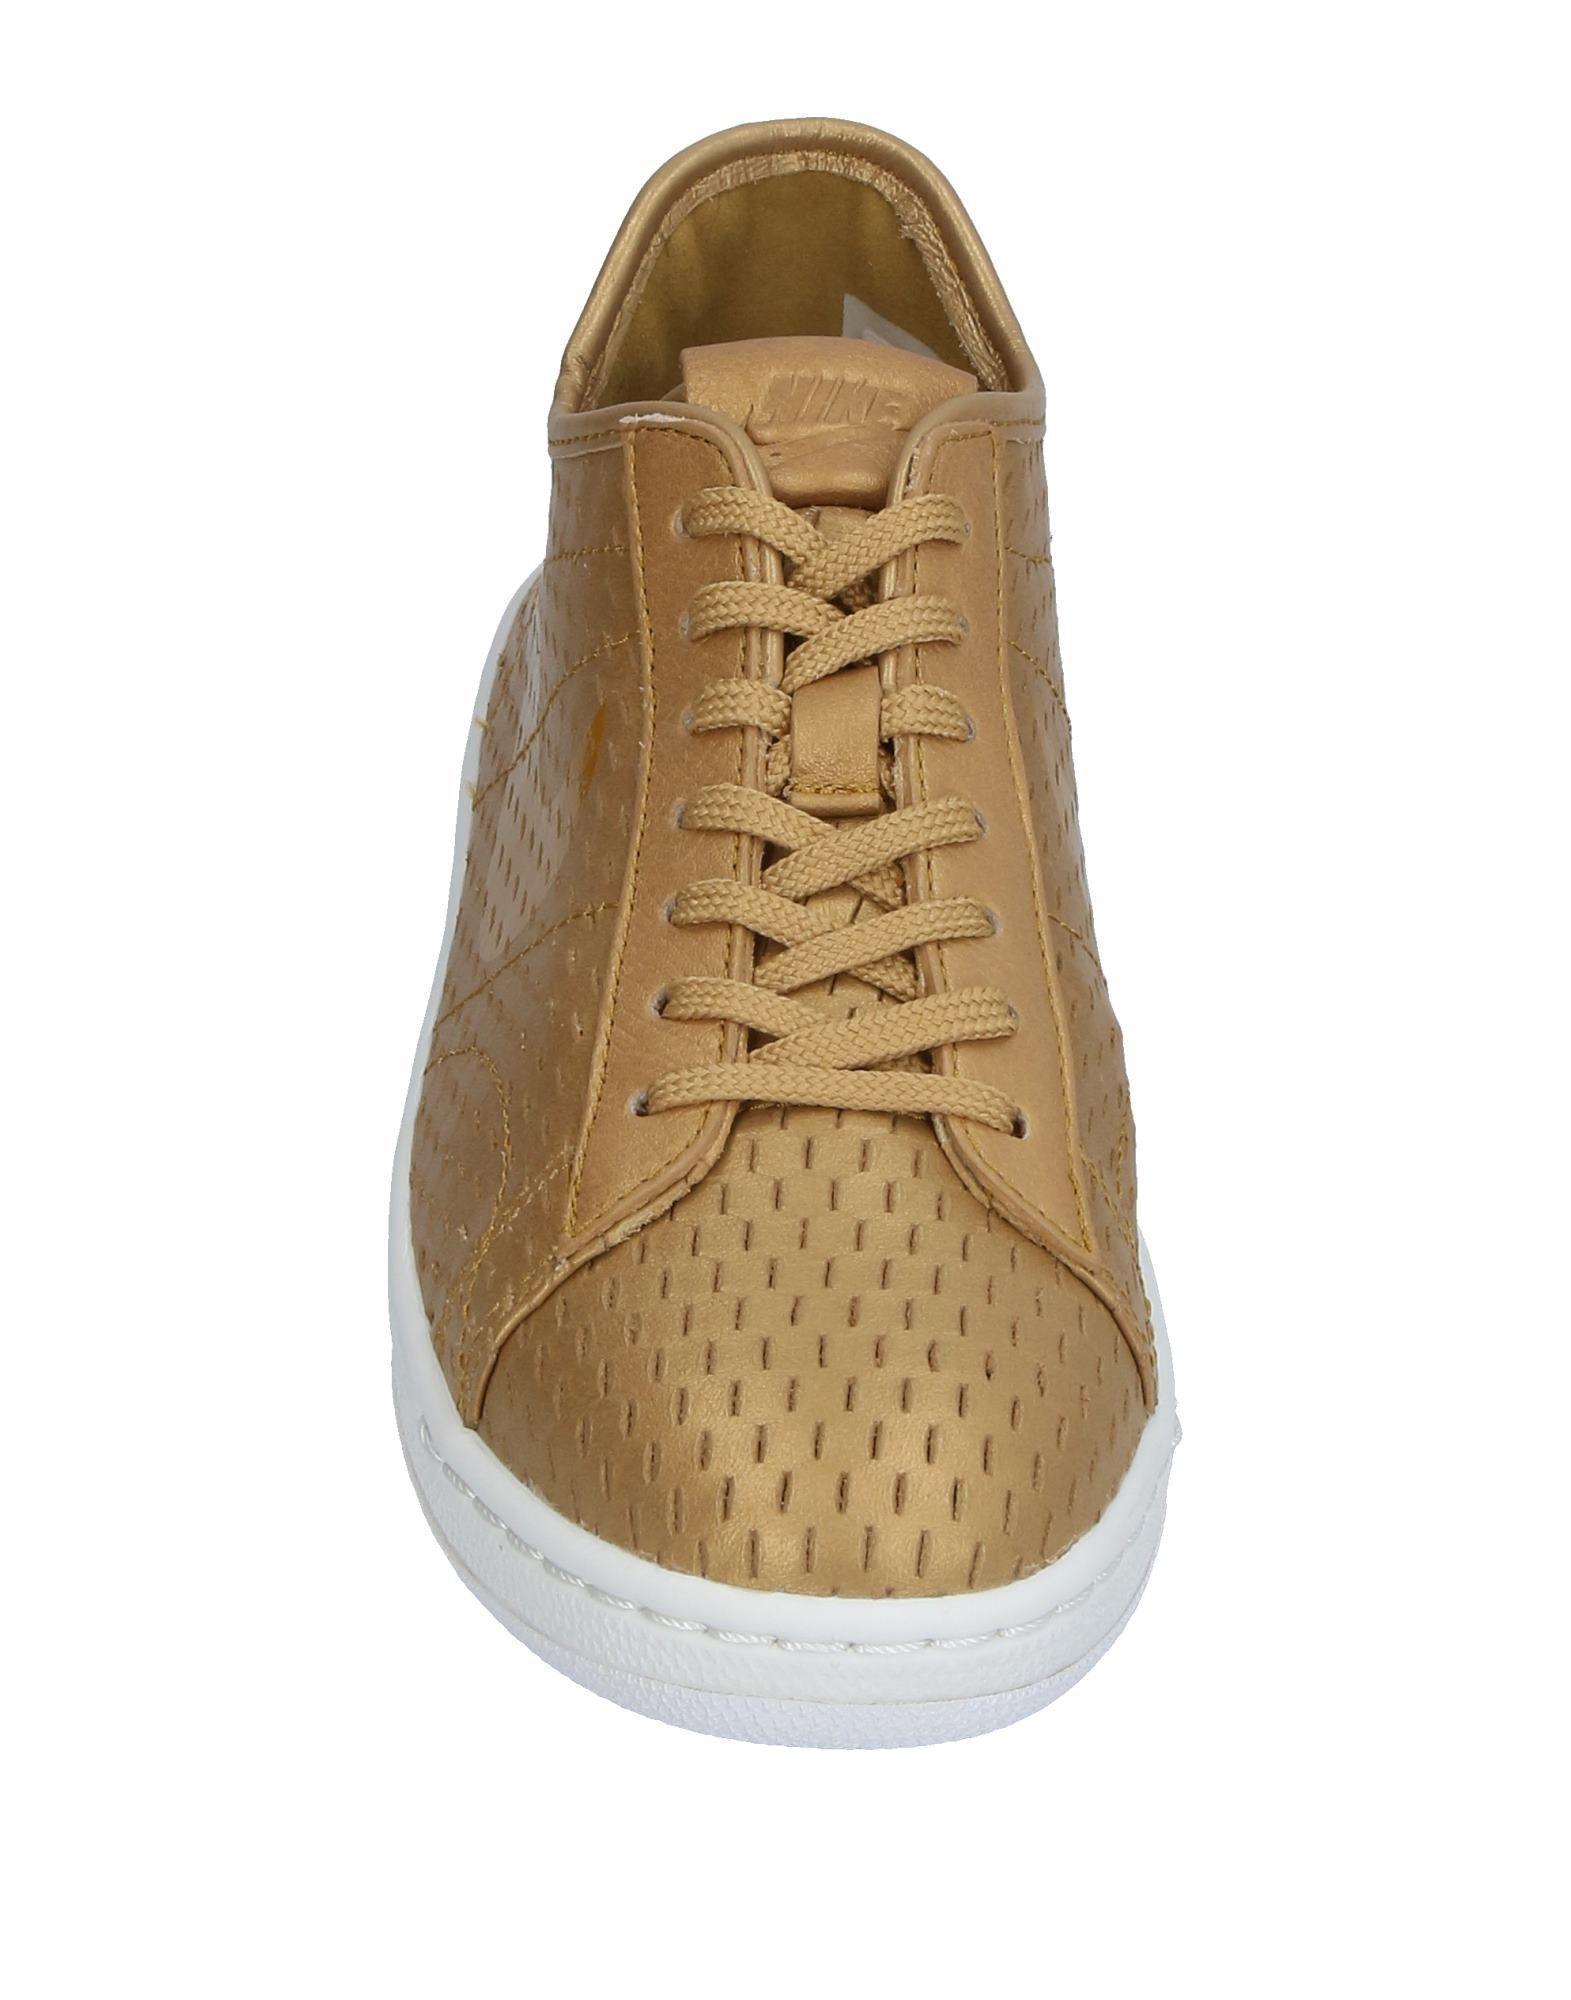 Nike Leather Low-tops & Sneakers in Gold (Metallic)